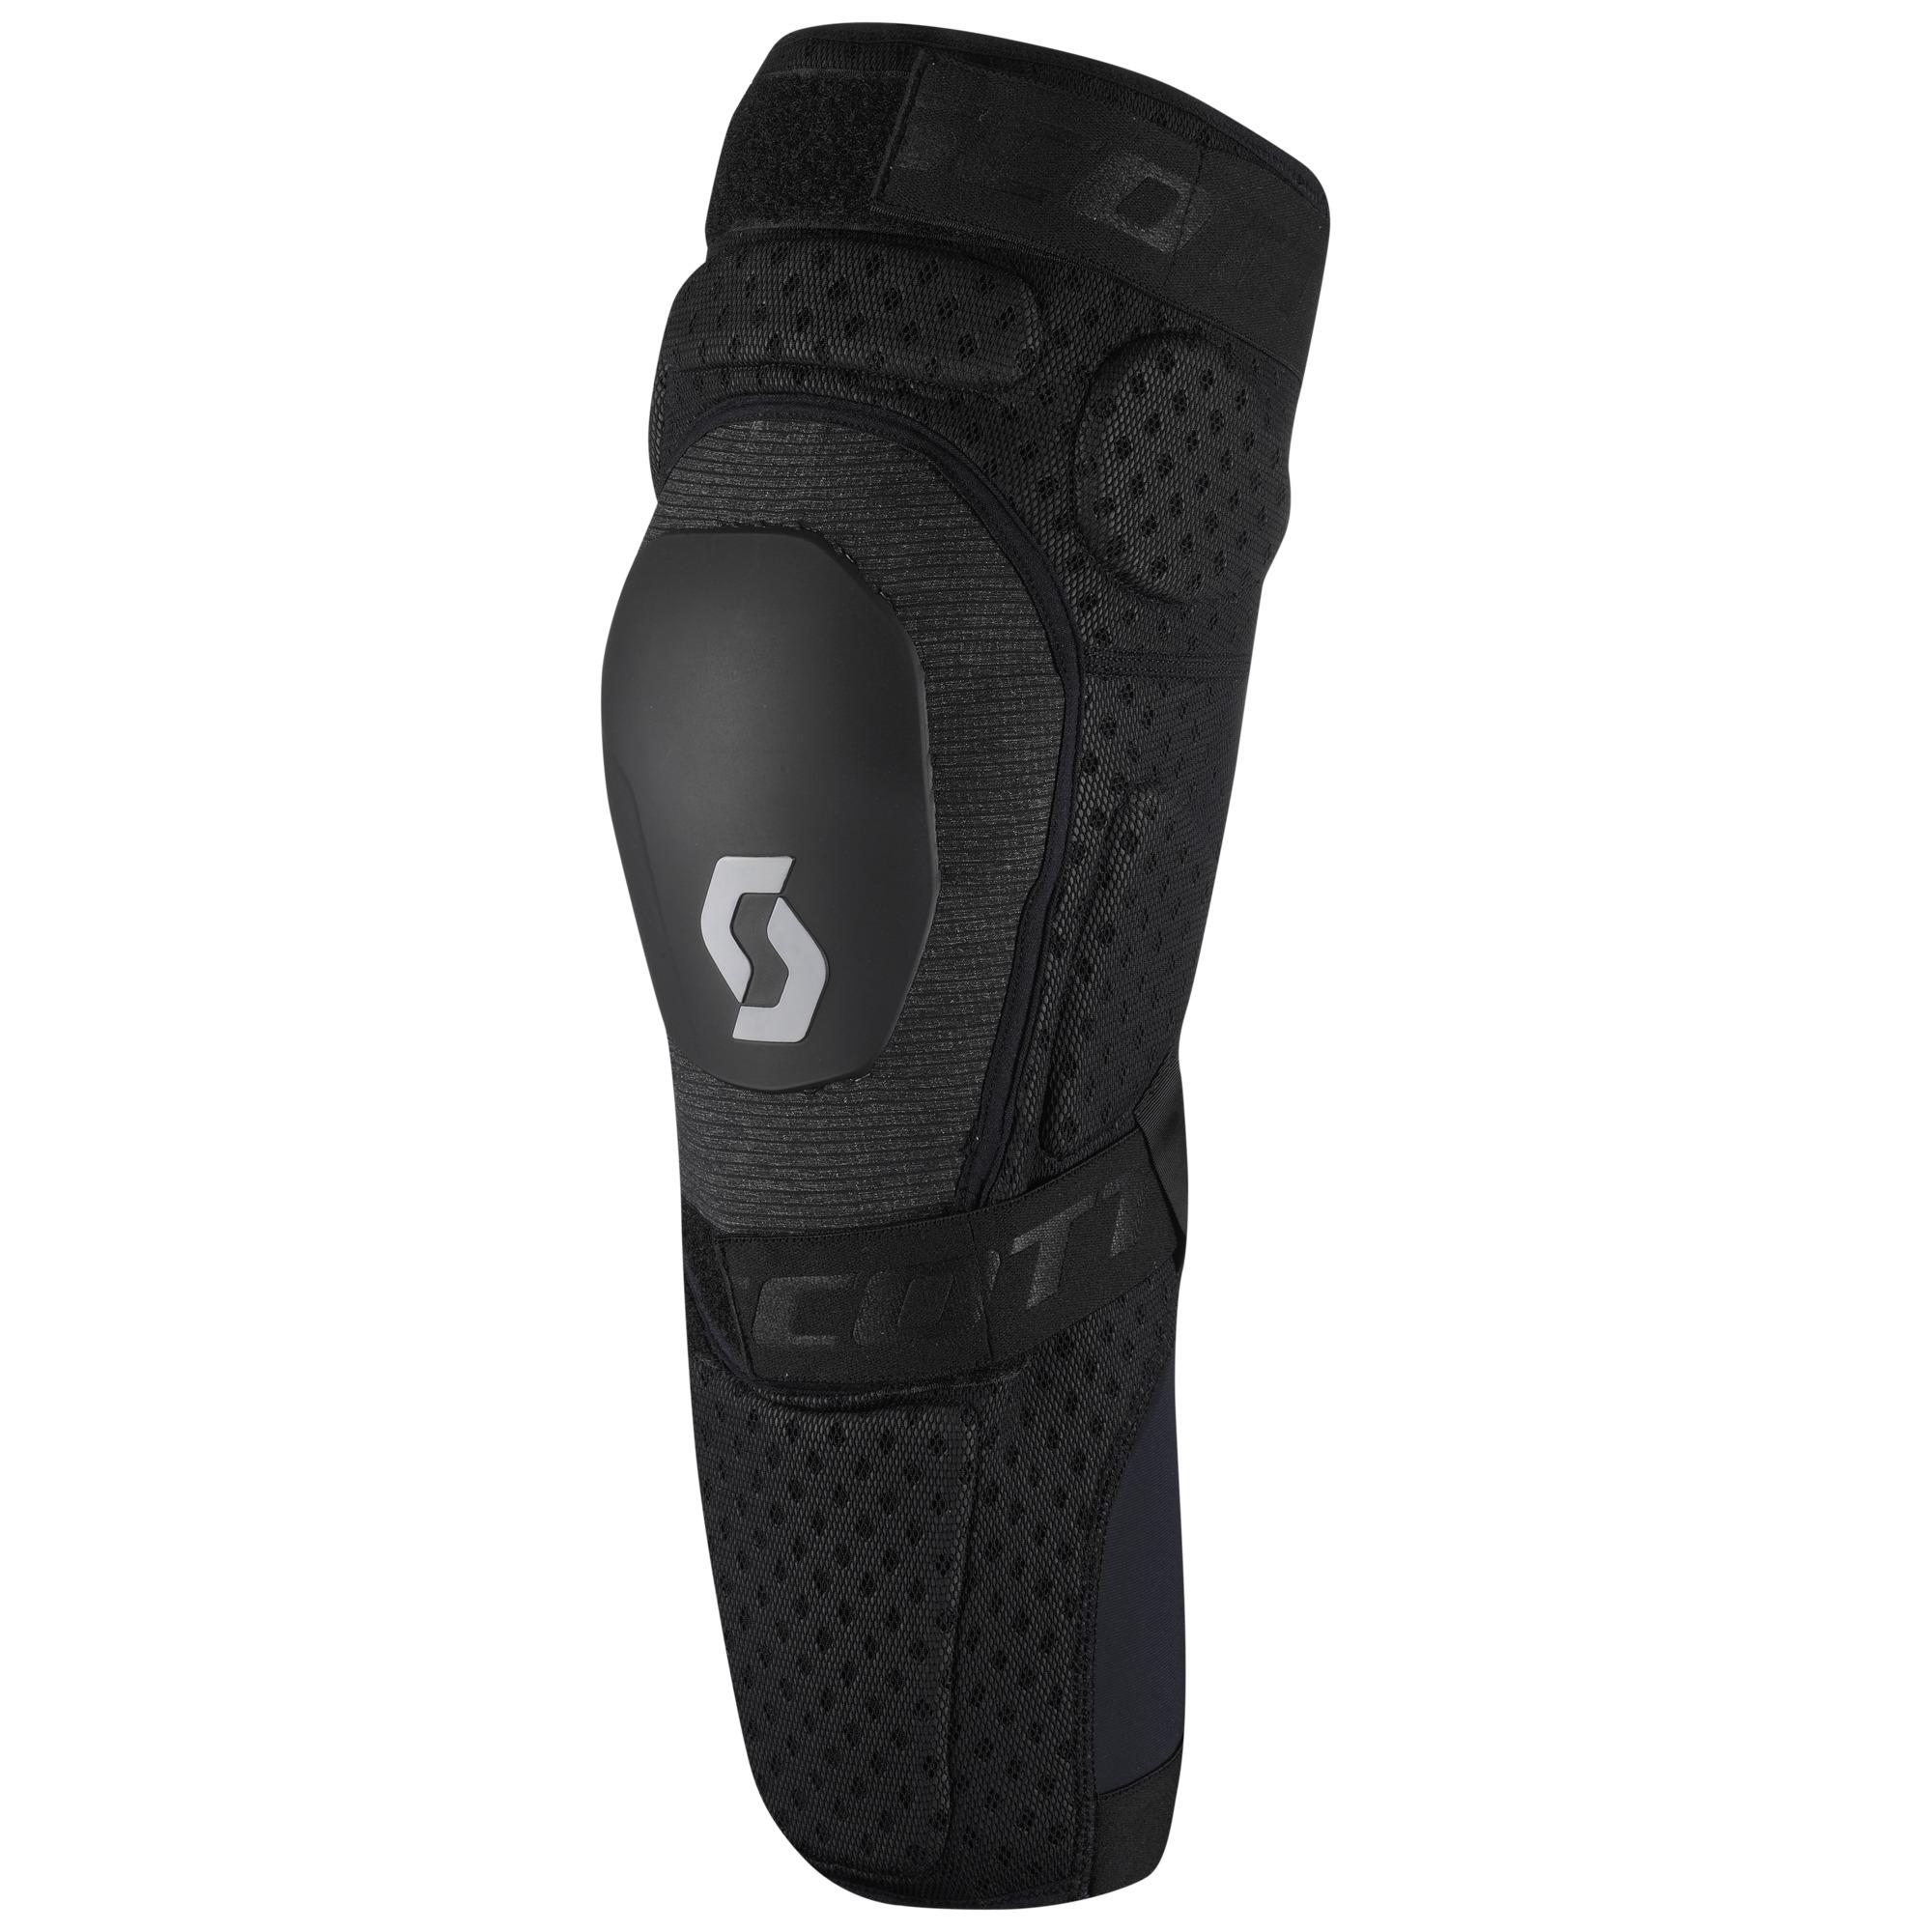 Scott Softcon Hybrid Black Knee Guard